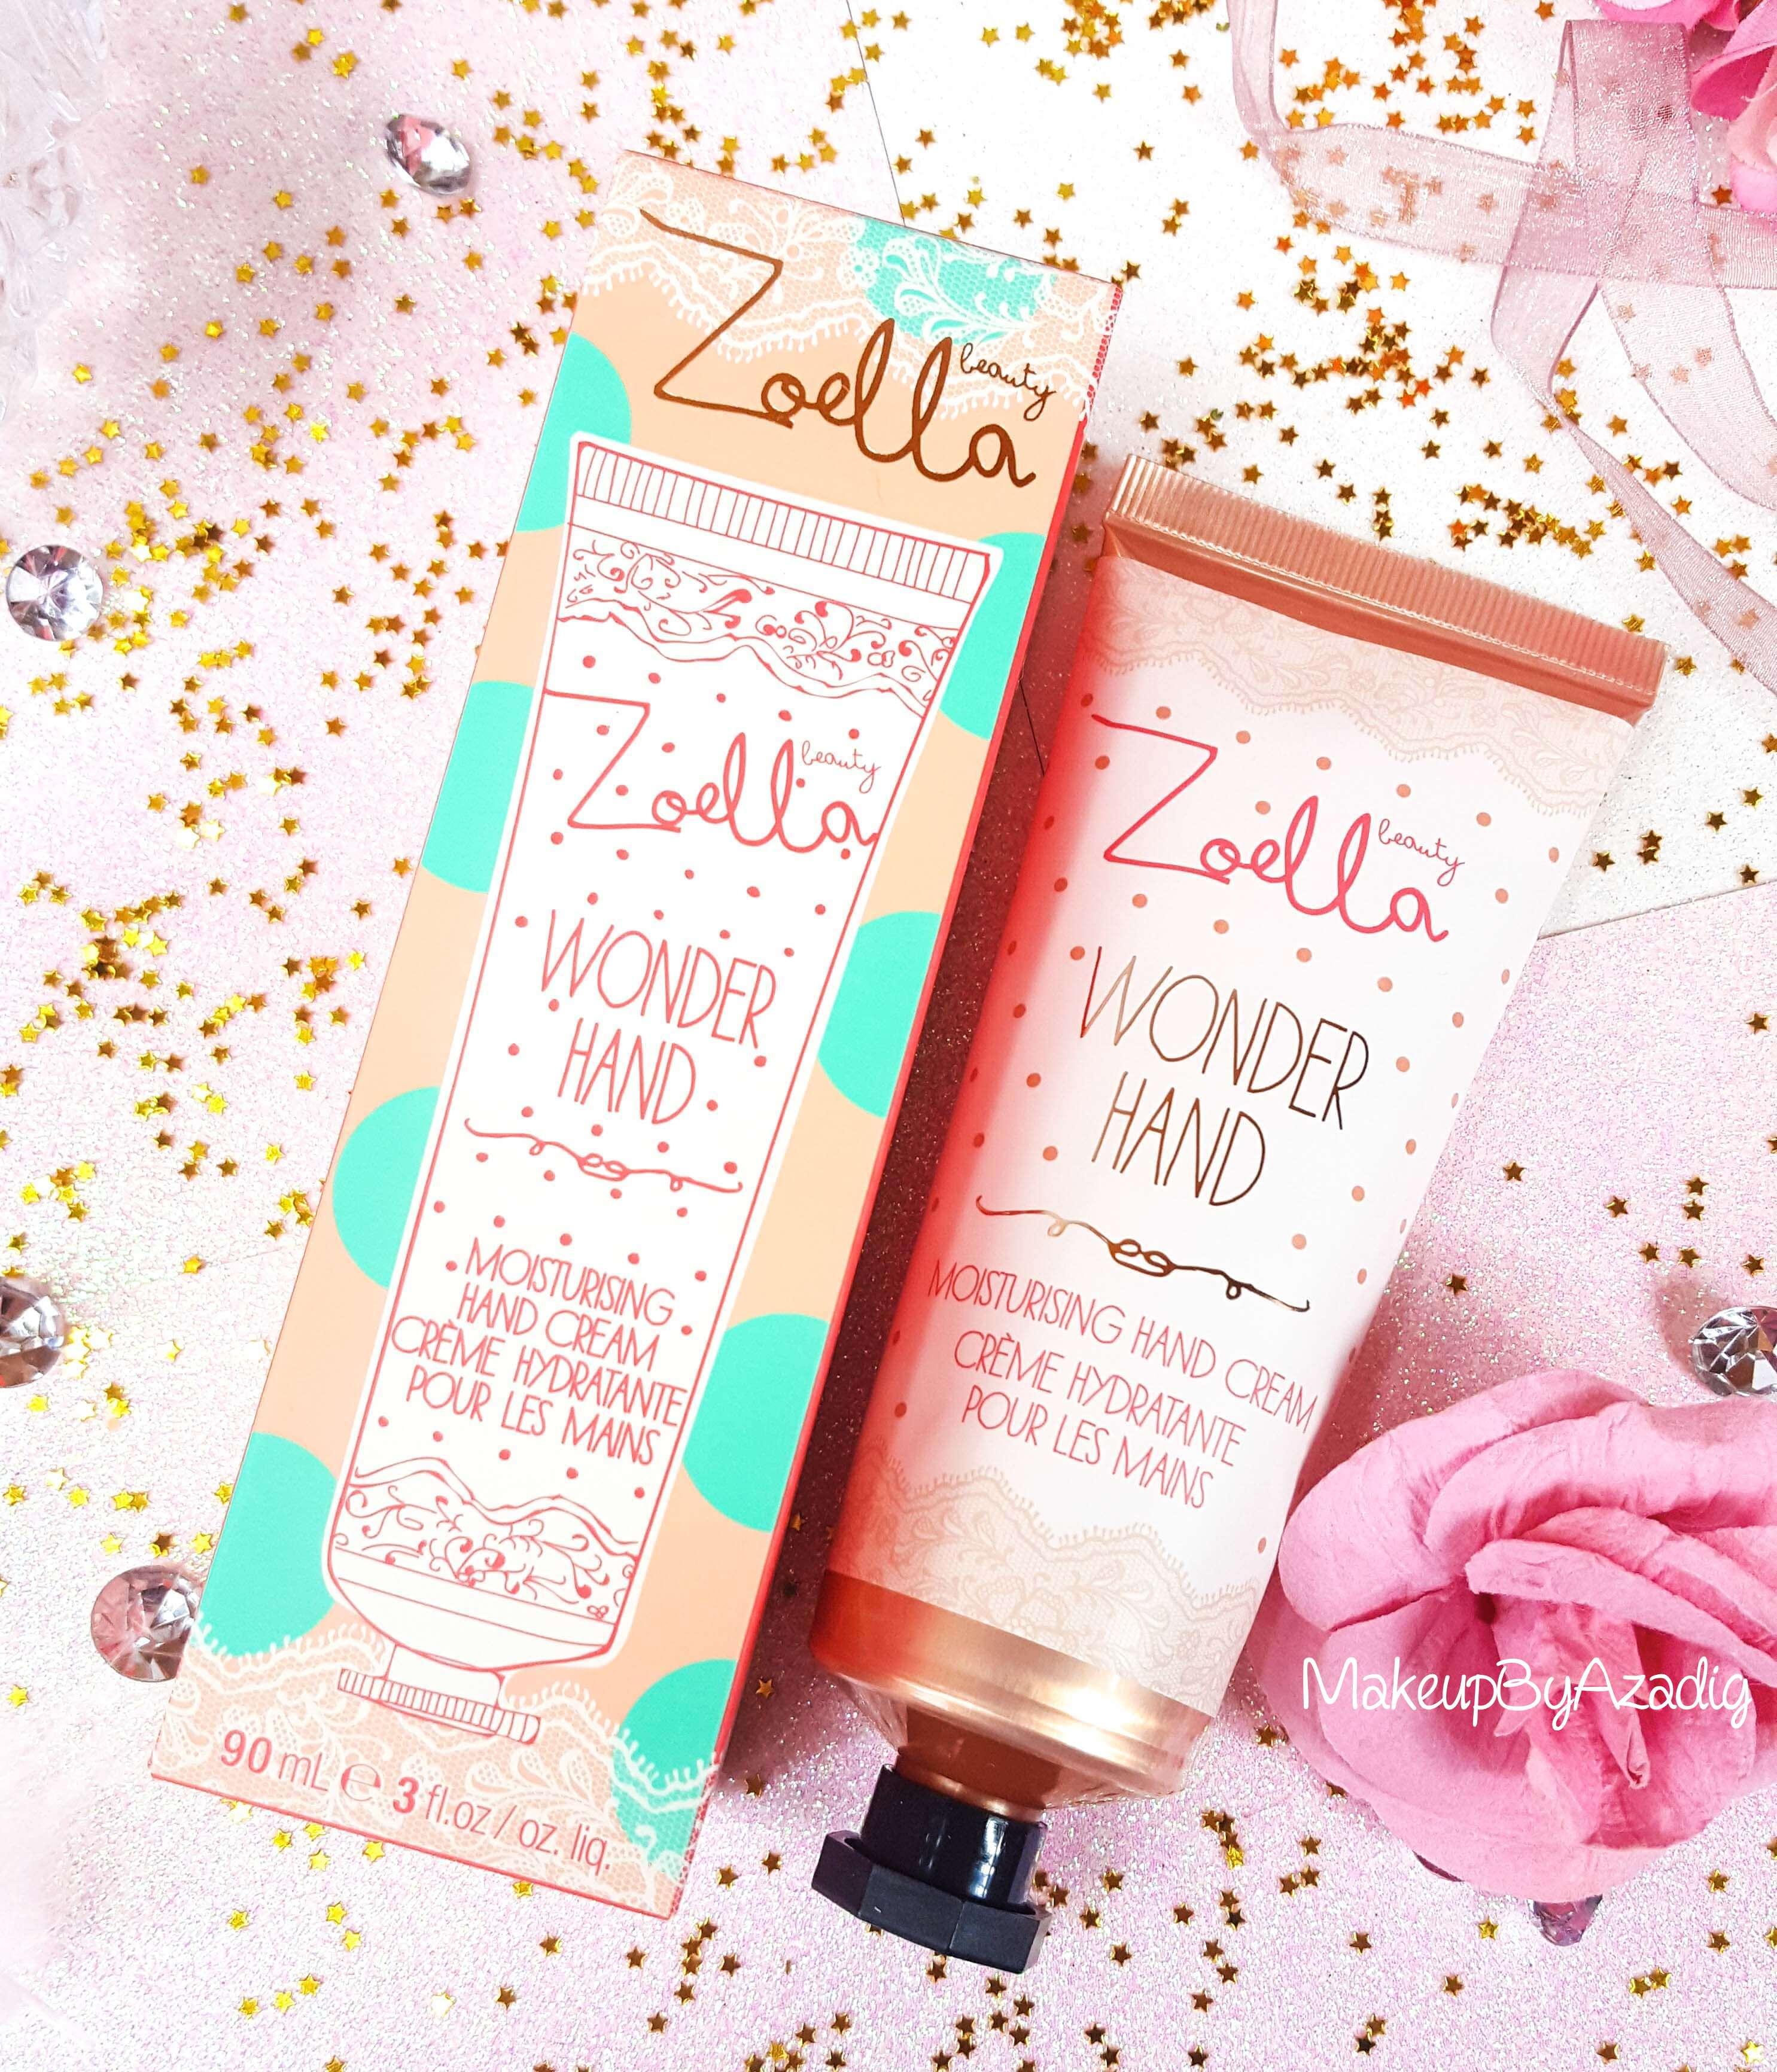 cremes-mains-zoella-etam-rose-lavande-amande-karite-prix-avis-troyes-makeupbyazadig-2